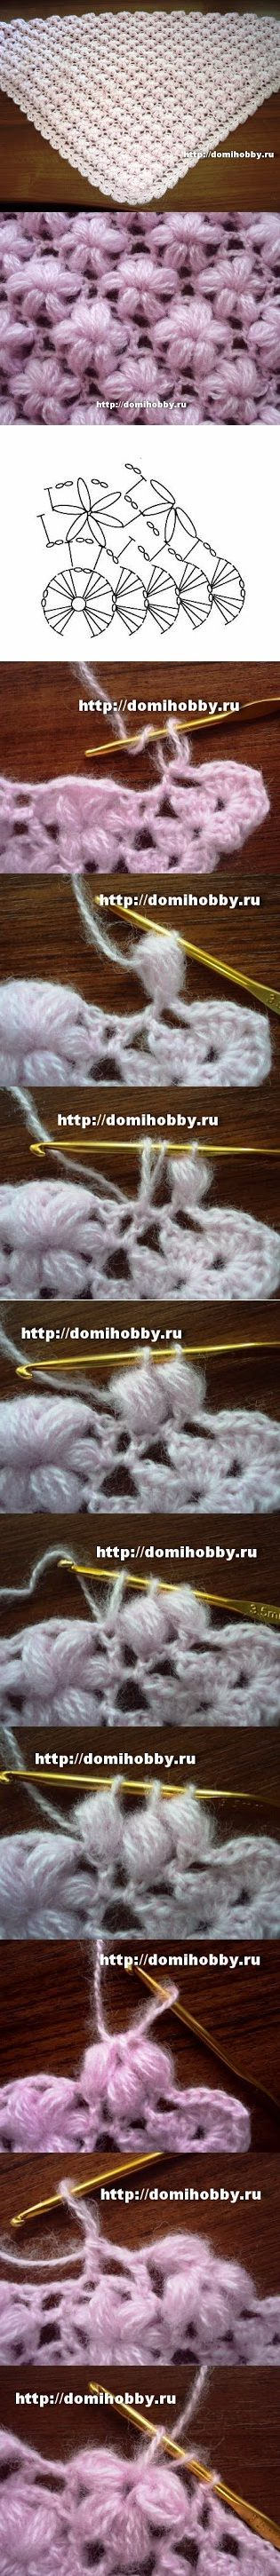 Sillas vintage el rinc 243 n di ree - Chal Flores Puff Http Neddle Crafts Blogspot Com